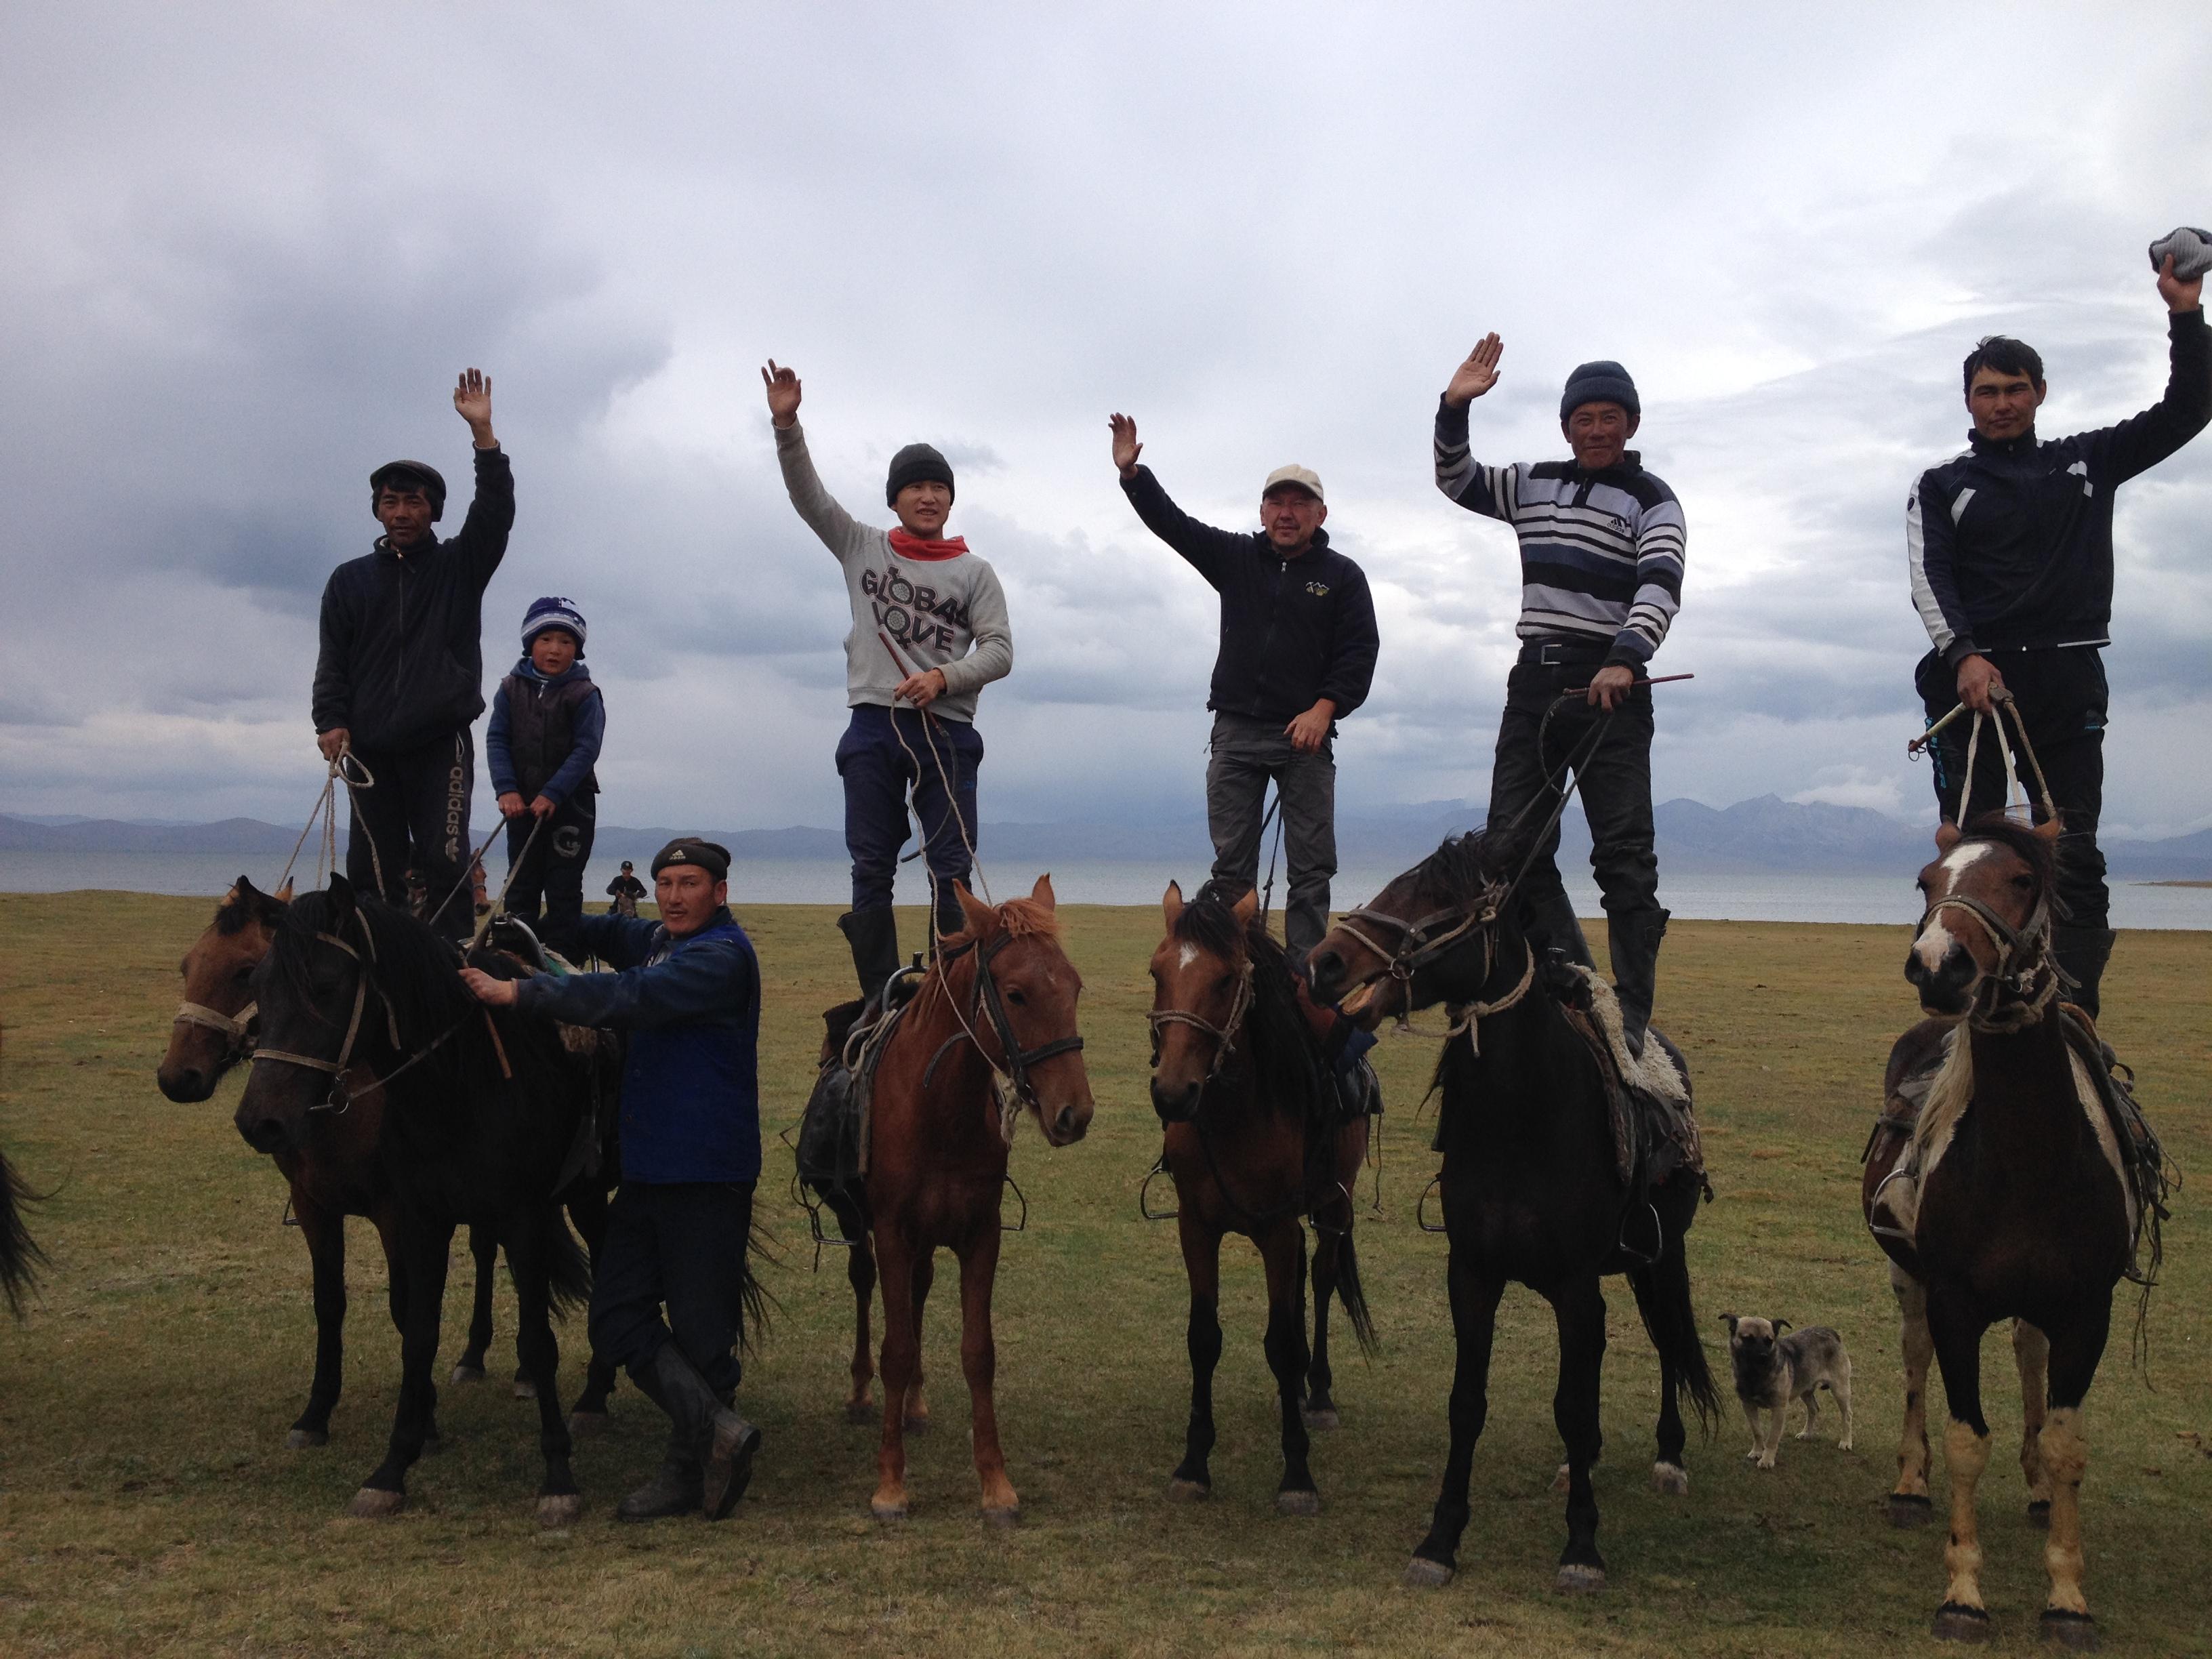 kökböro, Kirgistan